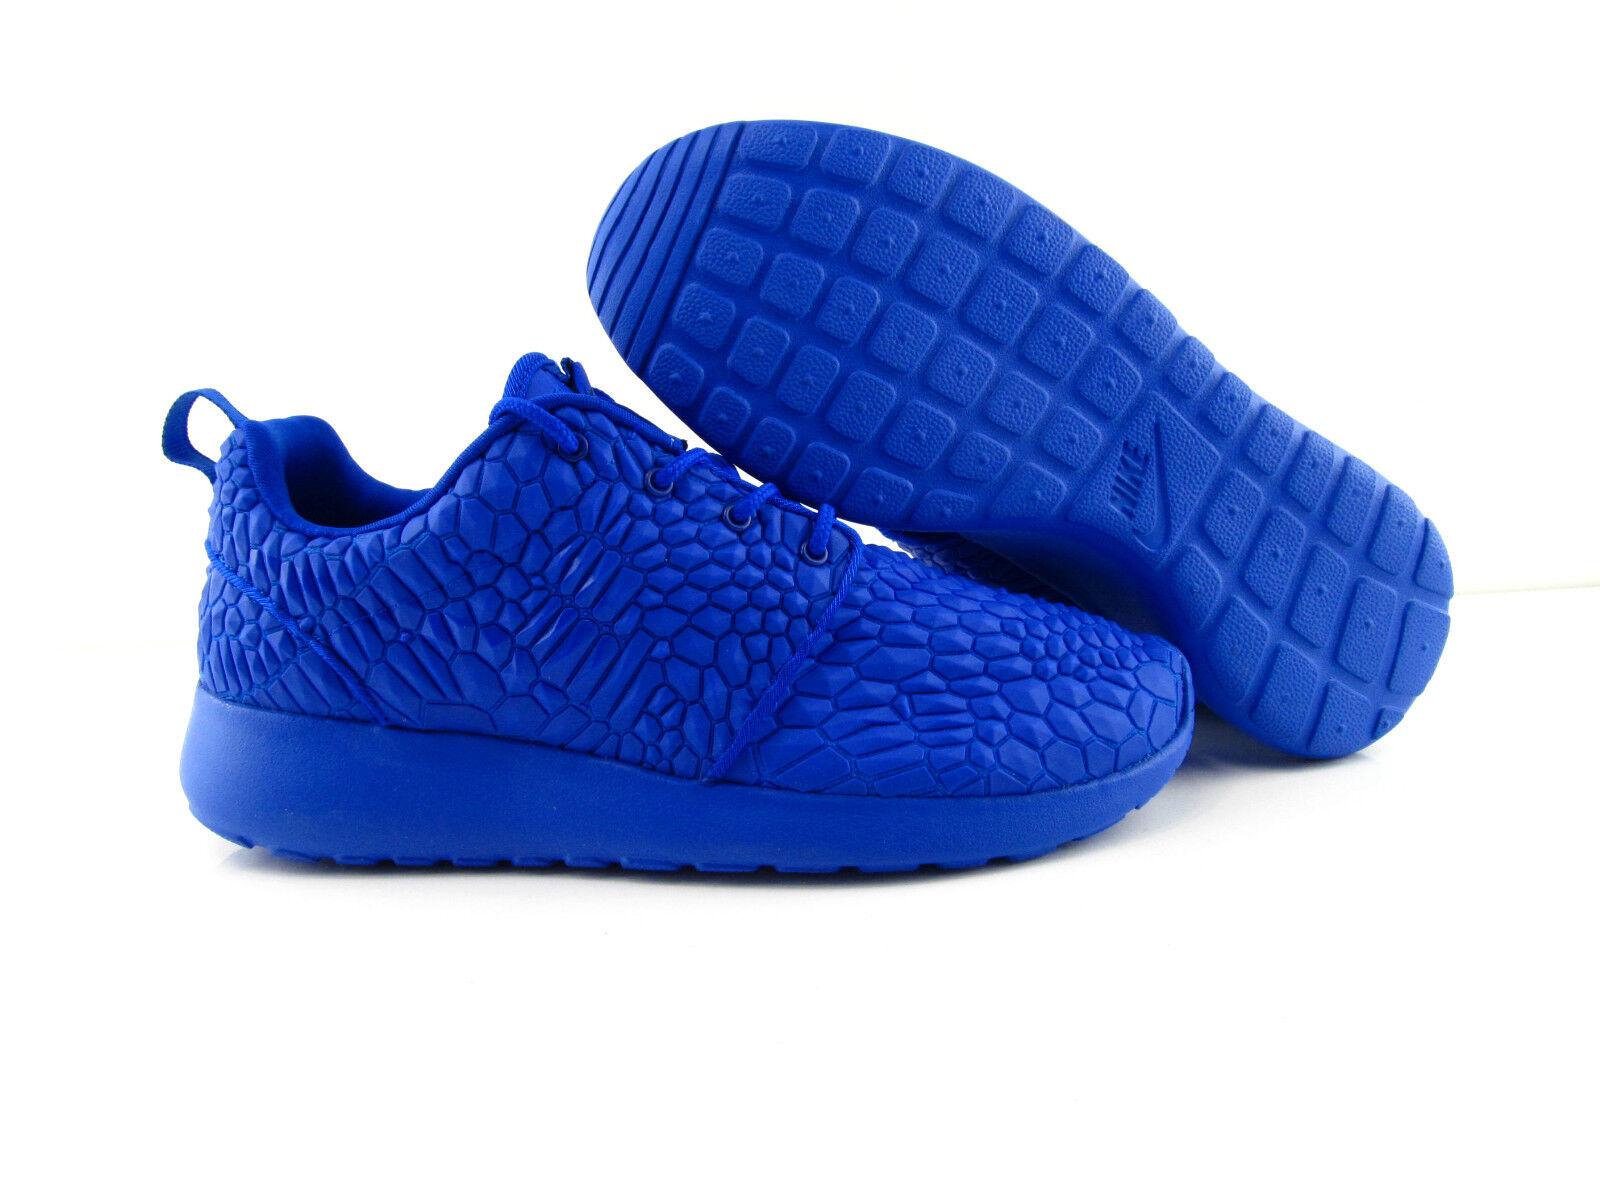 Nike roshe run DMB us 6.5/9.5 QS Racer Bleu triple Bleu us 6.5/9.5